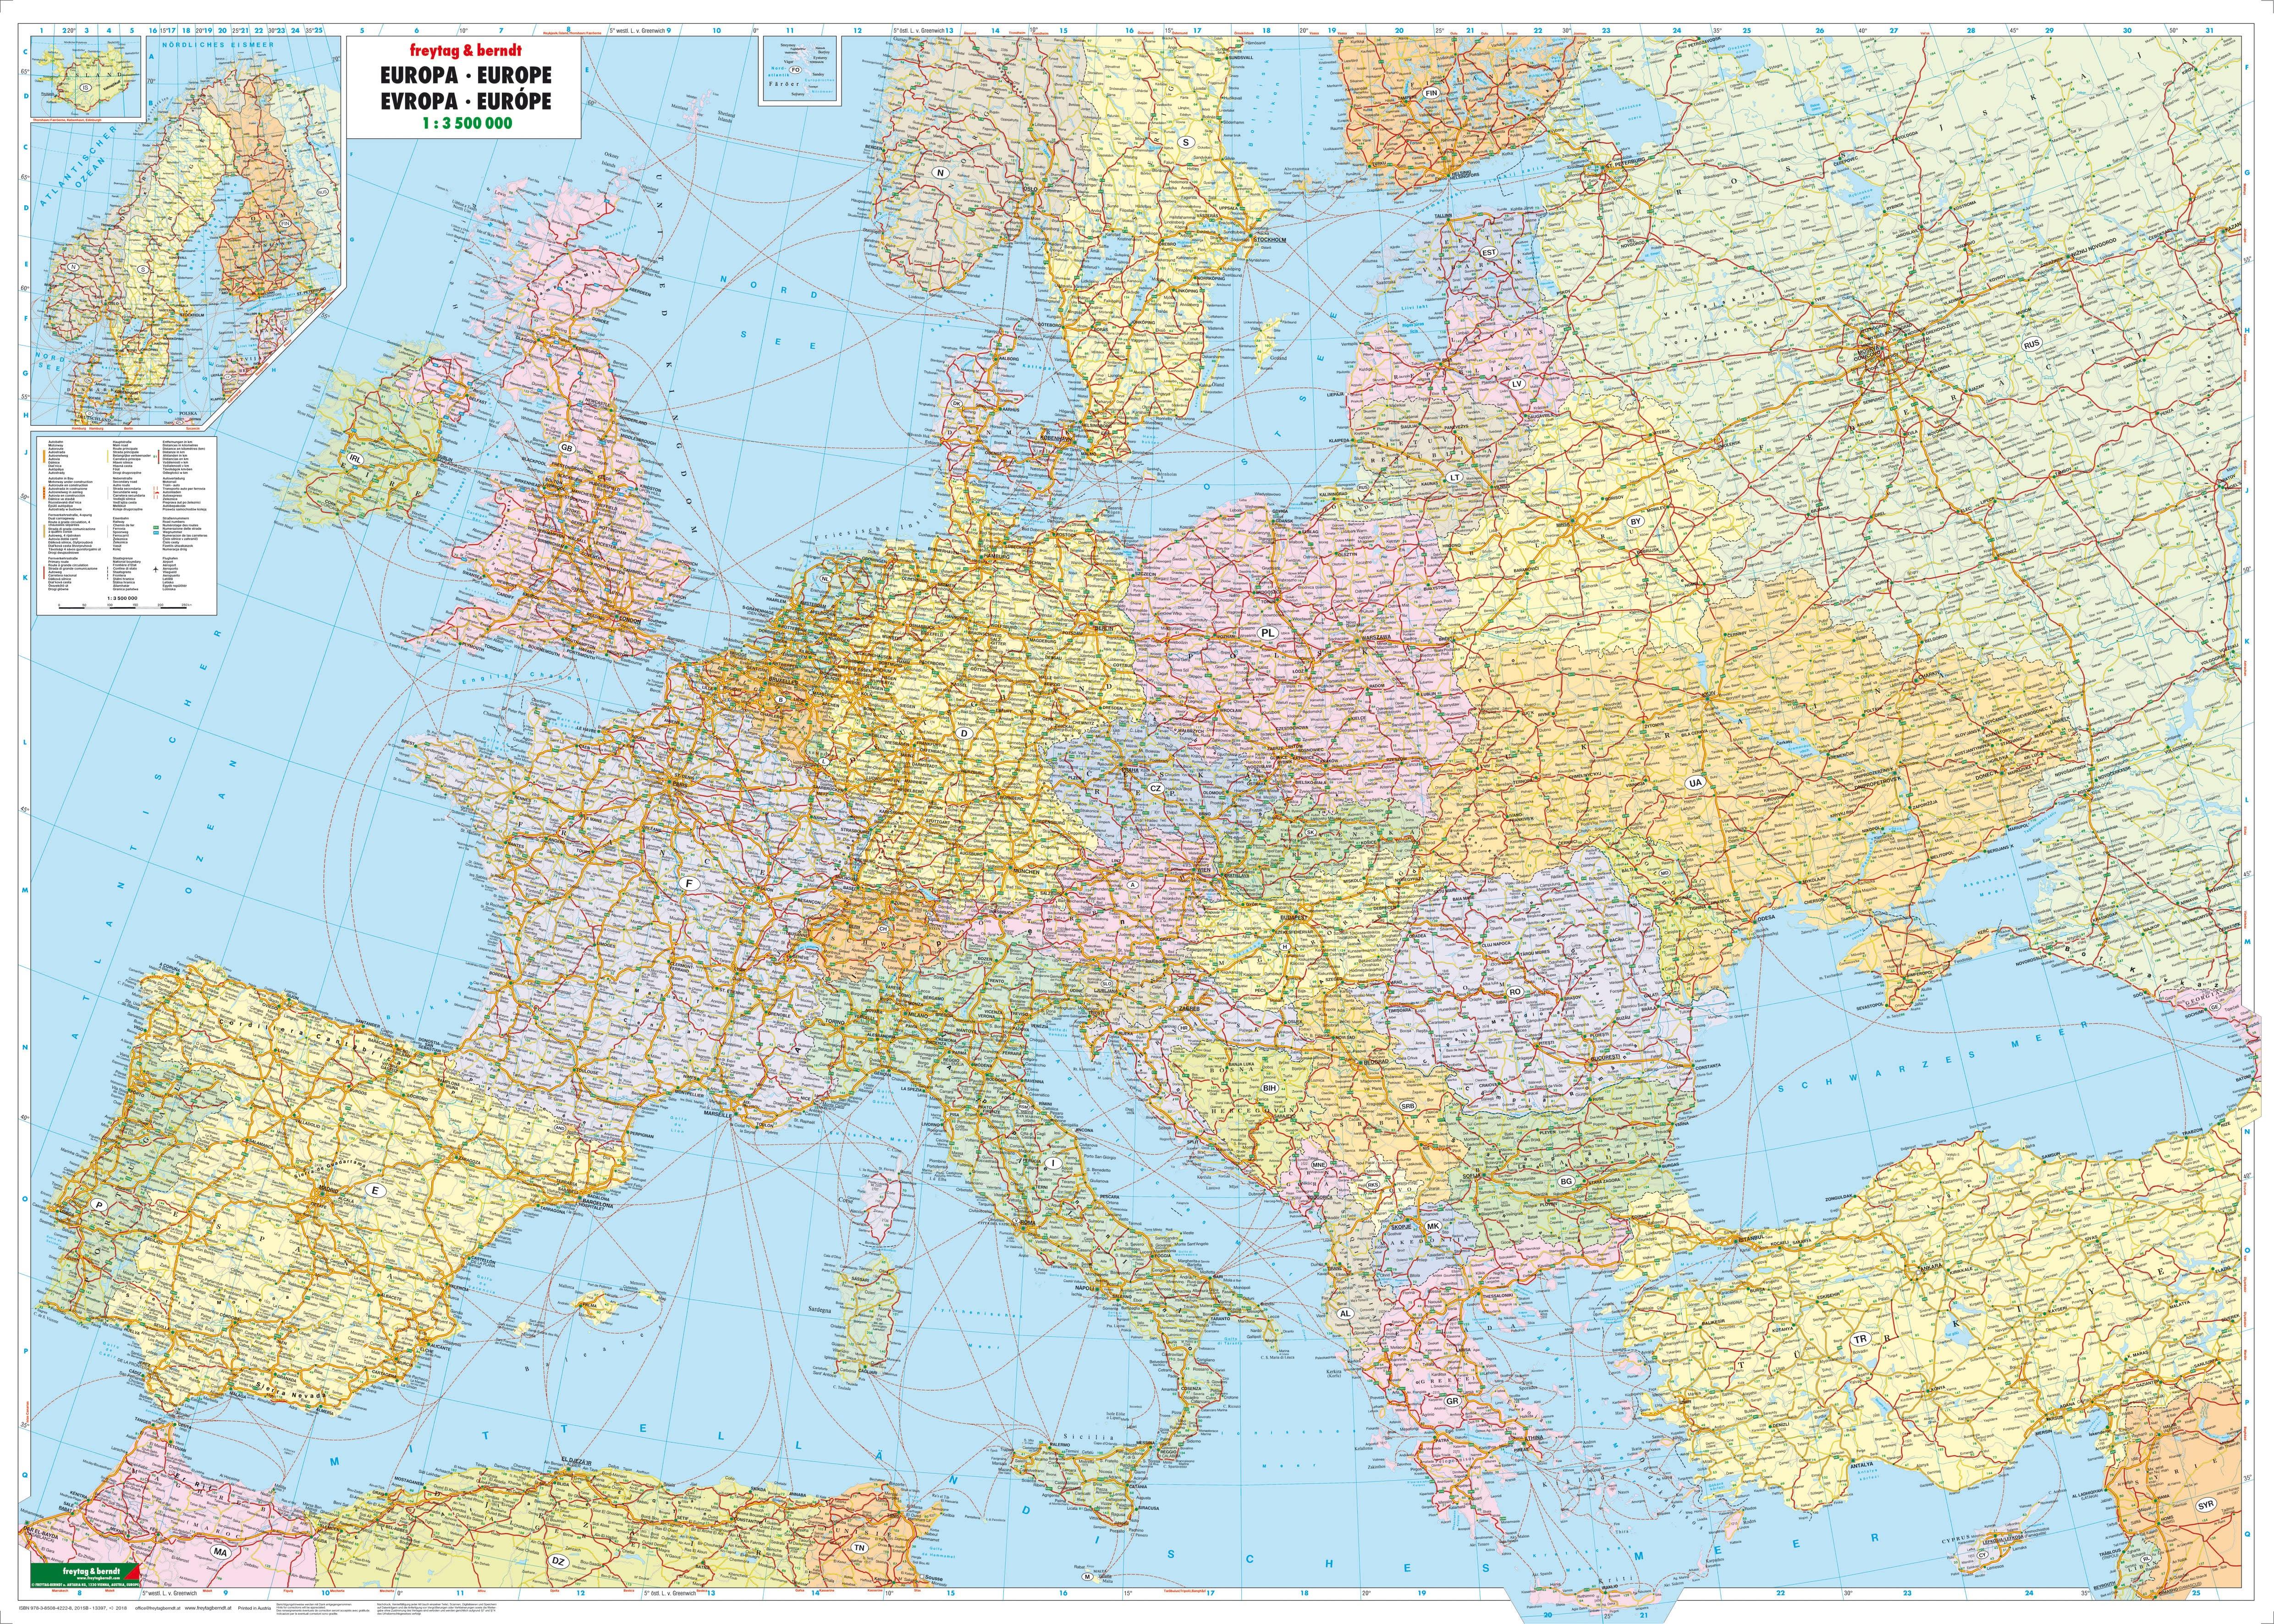 europakarte poster Politische Europa Straßen Karte Poster   Europa Landkarten  europakarte poster